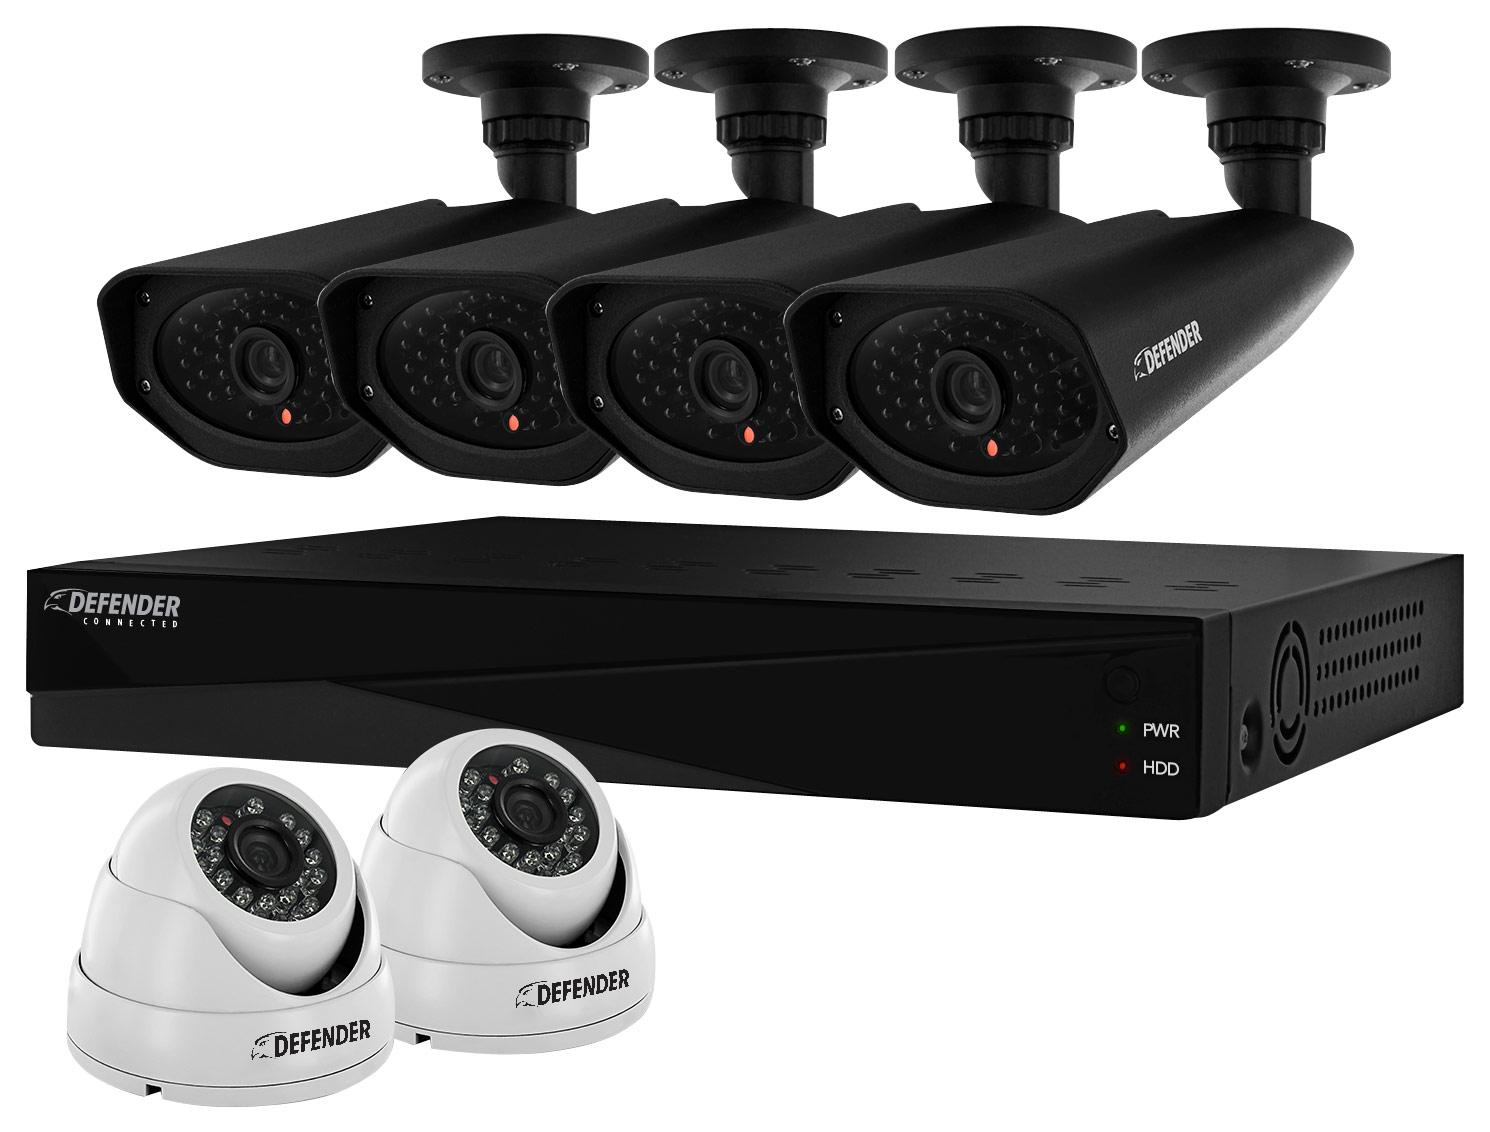 Defender PRO 8-Channel, 6-Camera Indoor/Outdoor DVR Surveillance System Black/White 21362